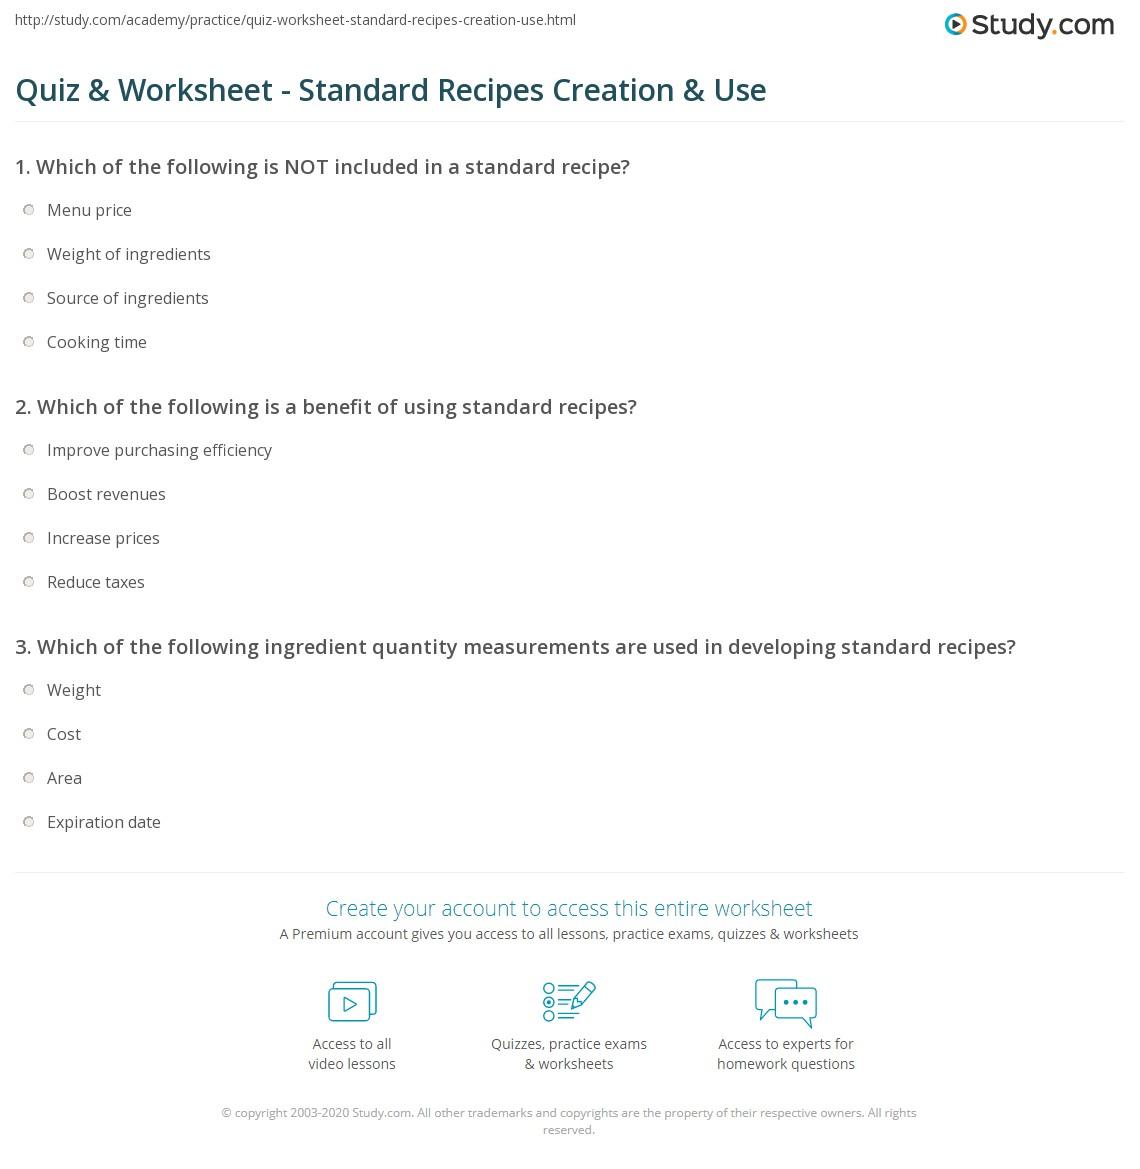 worksheet Reading A Recipe Worksheet quiz worksheet standard recipes creation use study com print development purpose worksheet